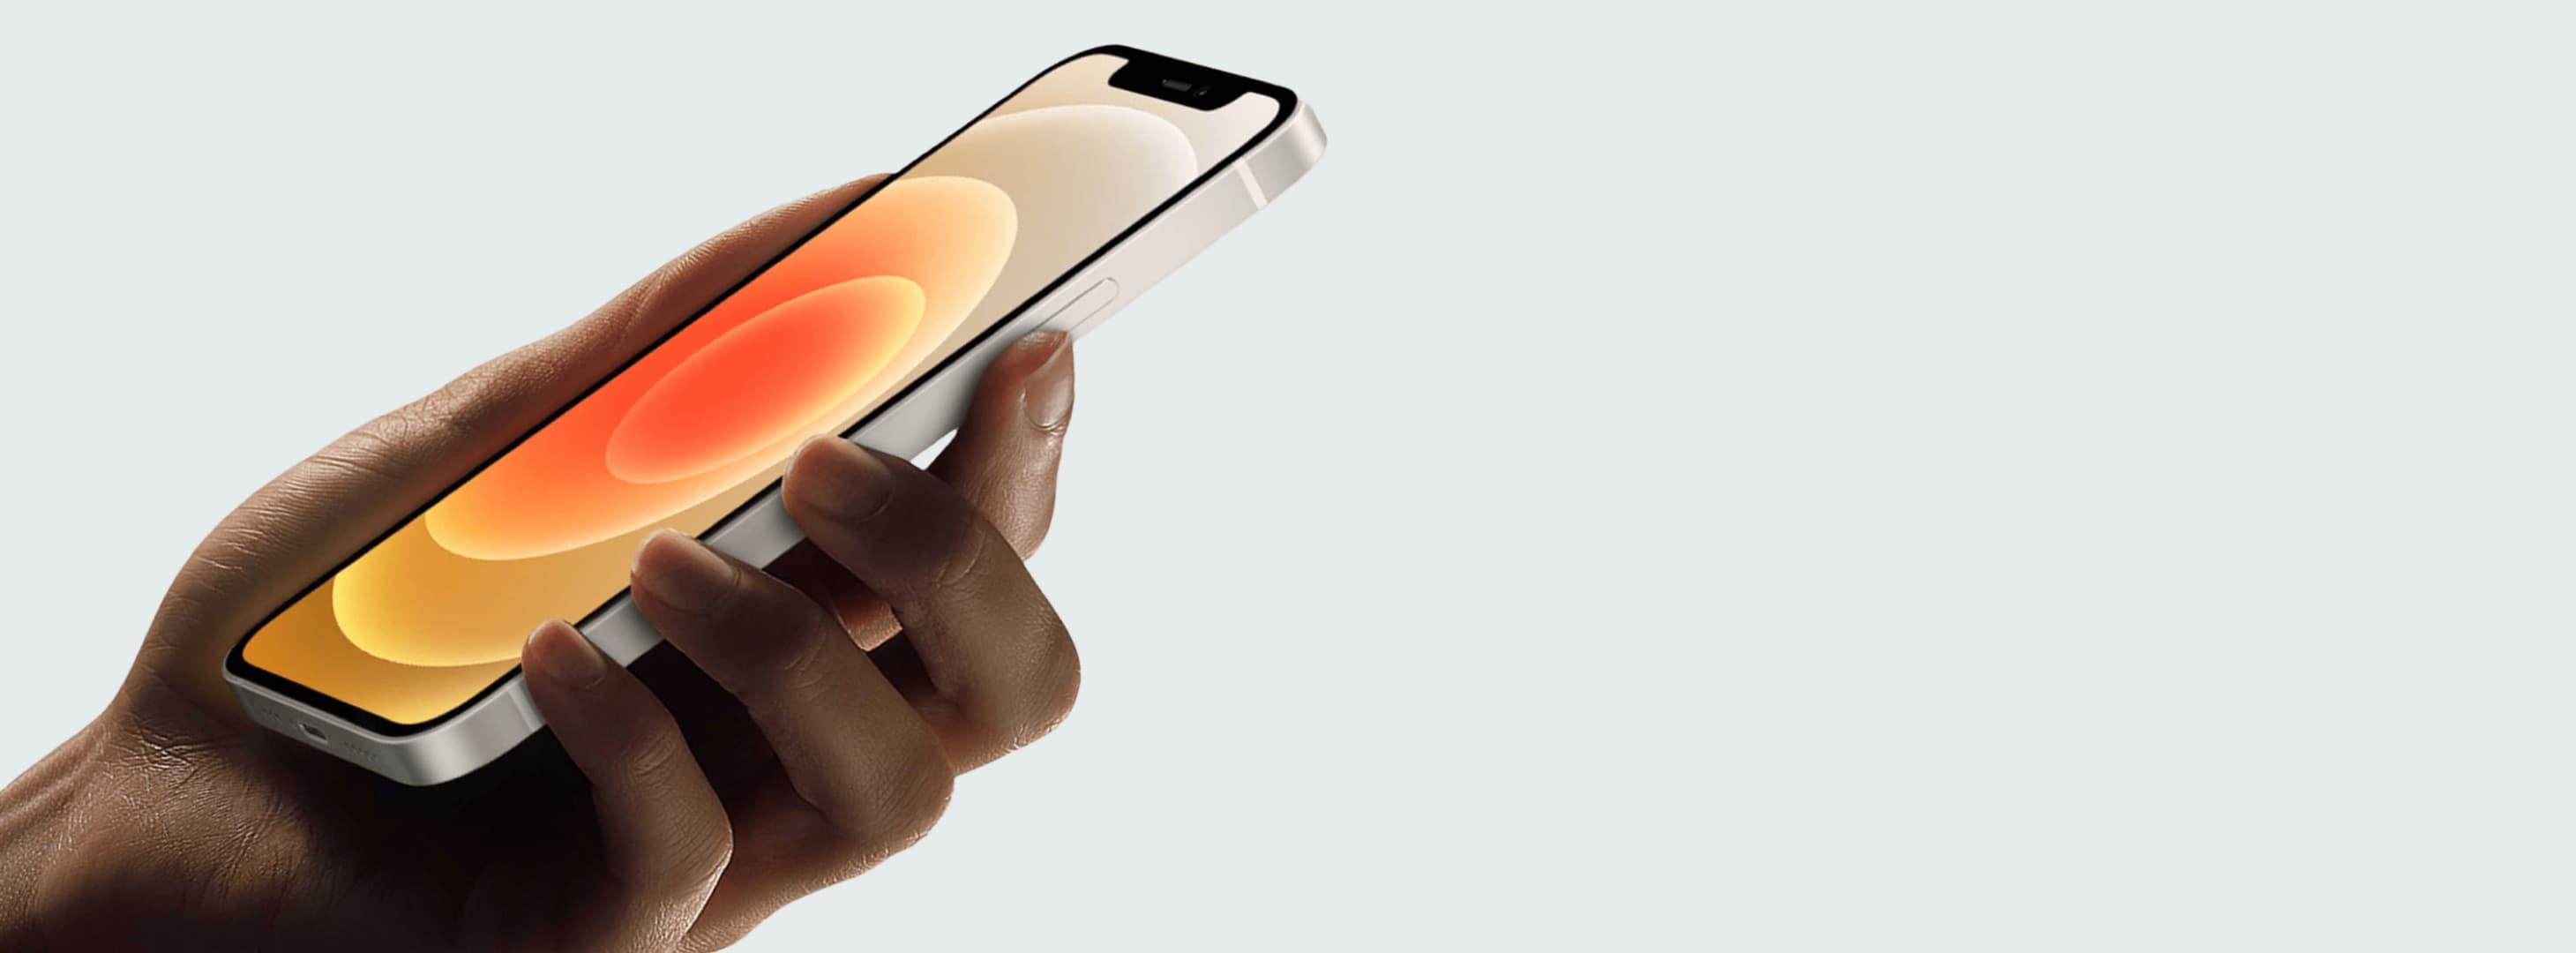 allapplenews-iphone-12-in-hand